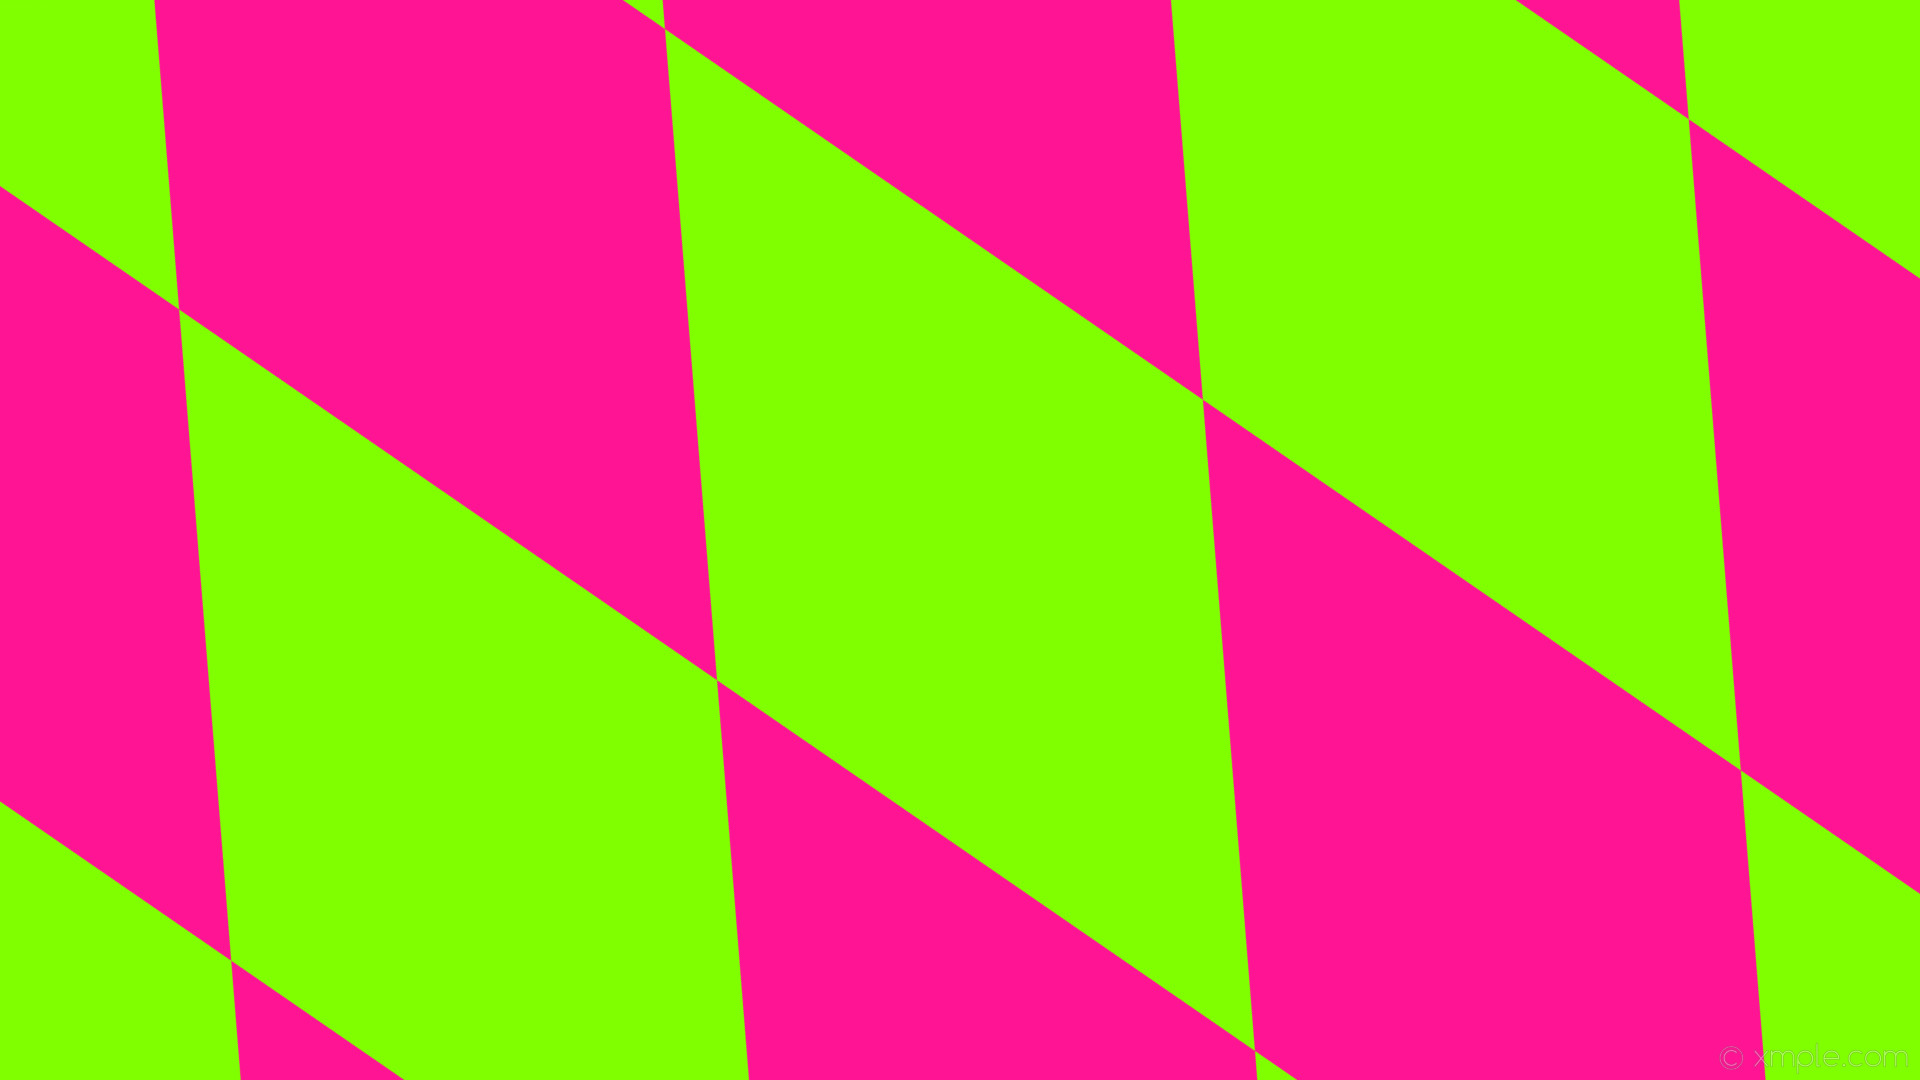 wallpaper green pink diamond lozenge rhombus chartreuse deep pink #7fff00  #ff1493 120° 1180px